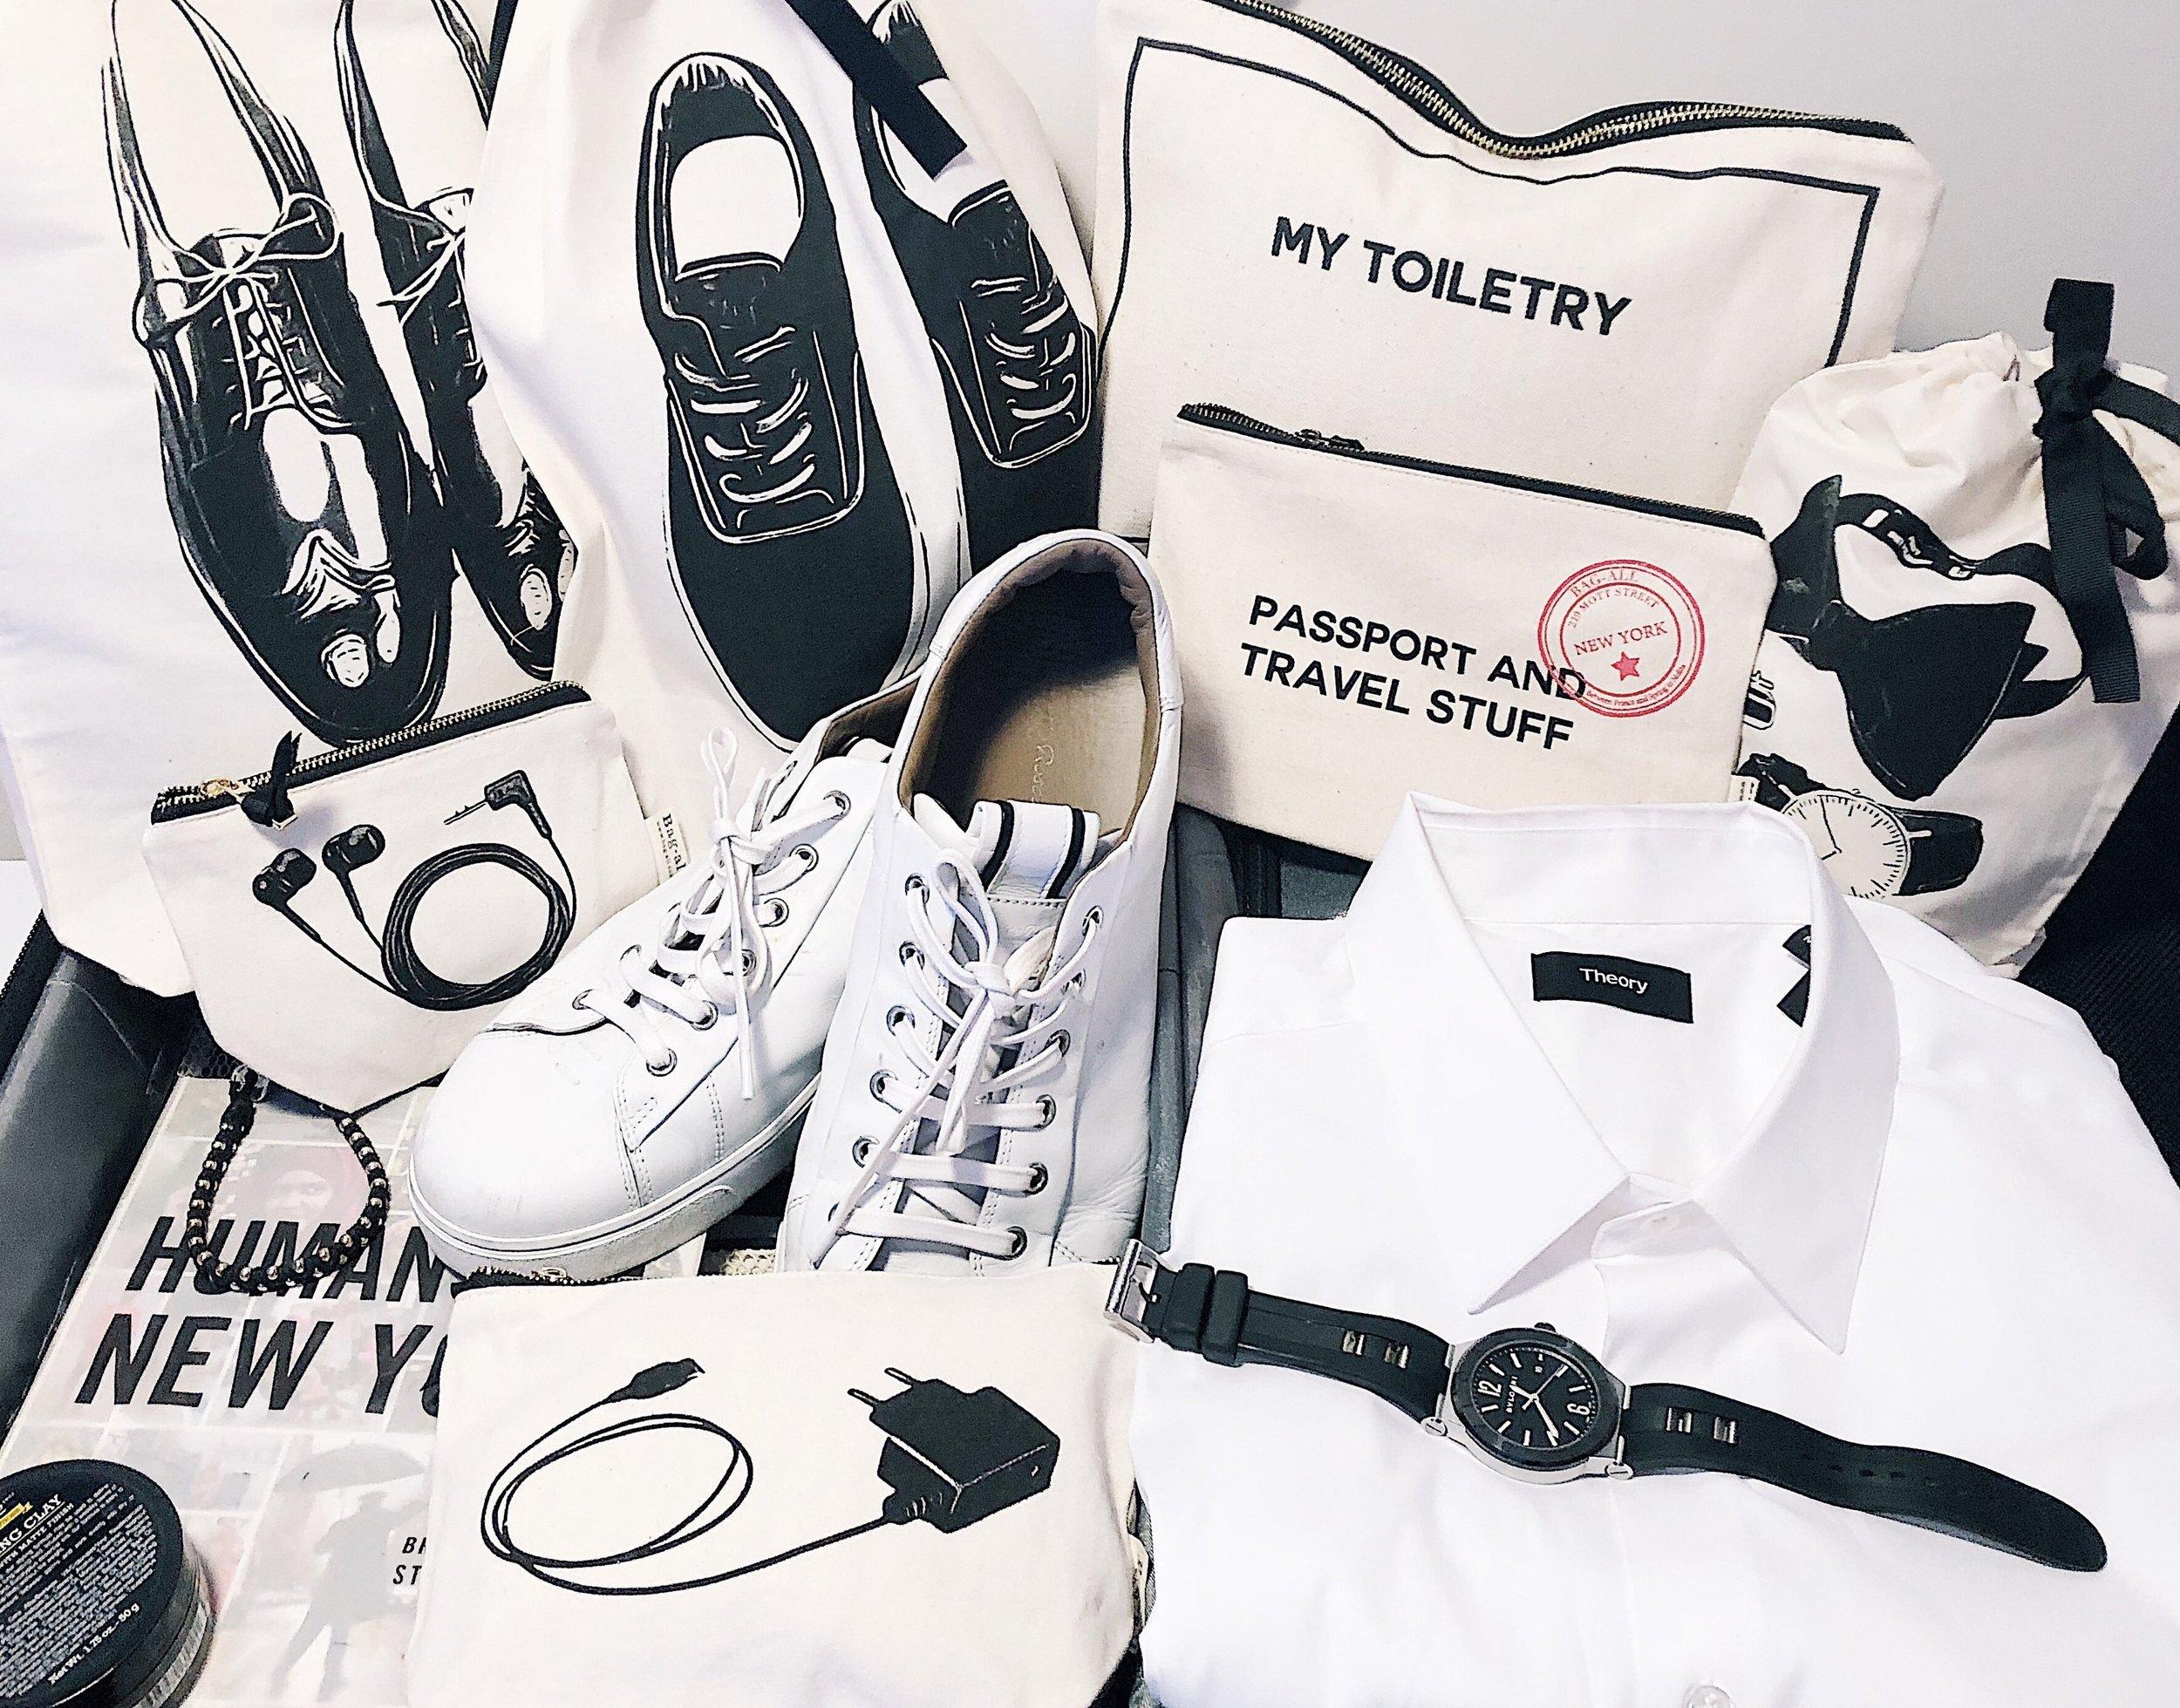 men%27s+shoe+bag%2C+my+toiletry+case%2C+passport+case%2C+men%27s+accessories%2C+charger+bag%2C+mood+bag-all.jpg